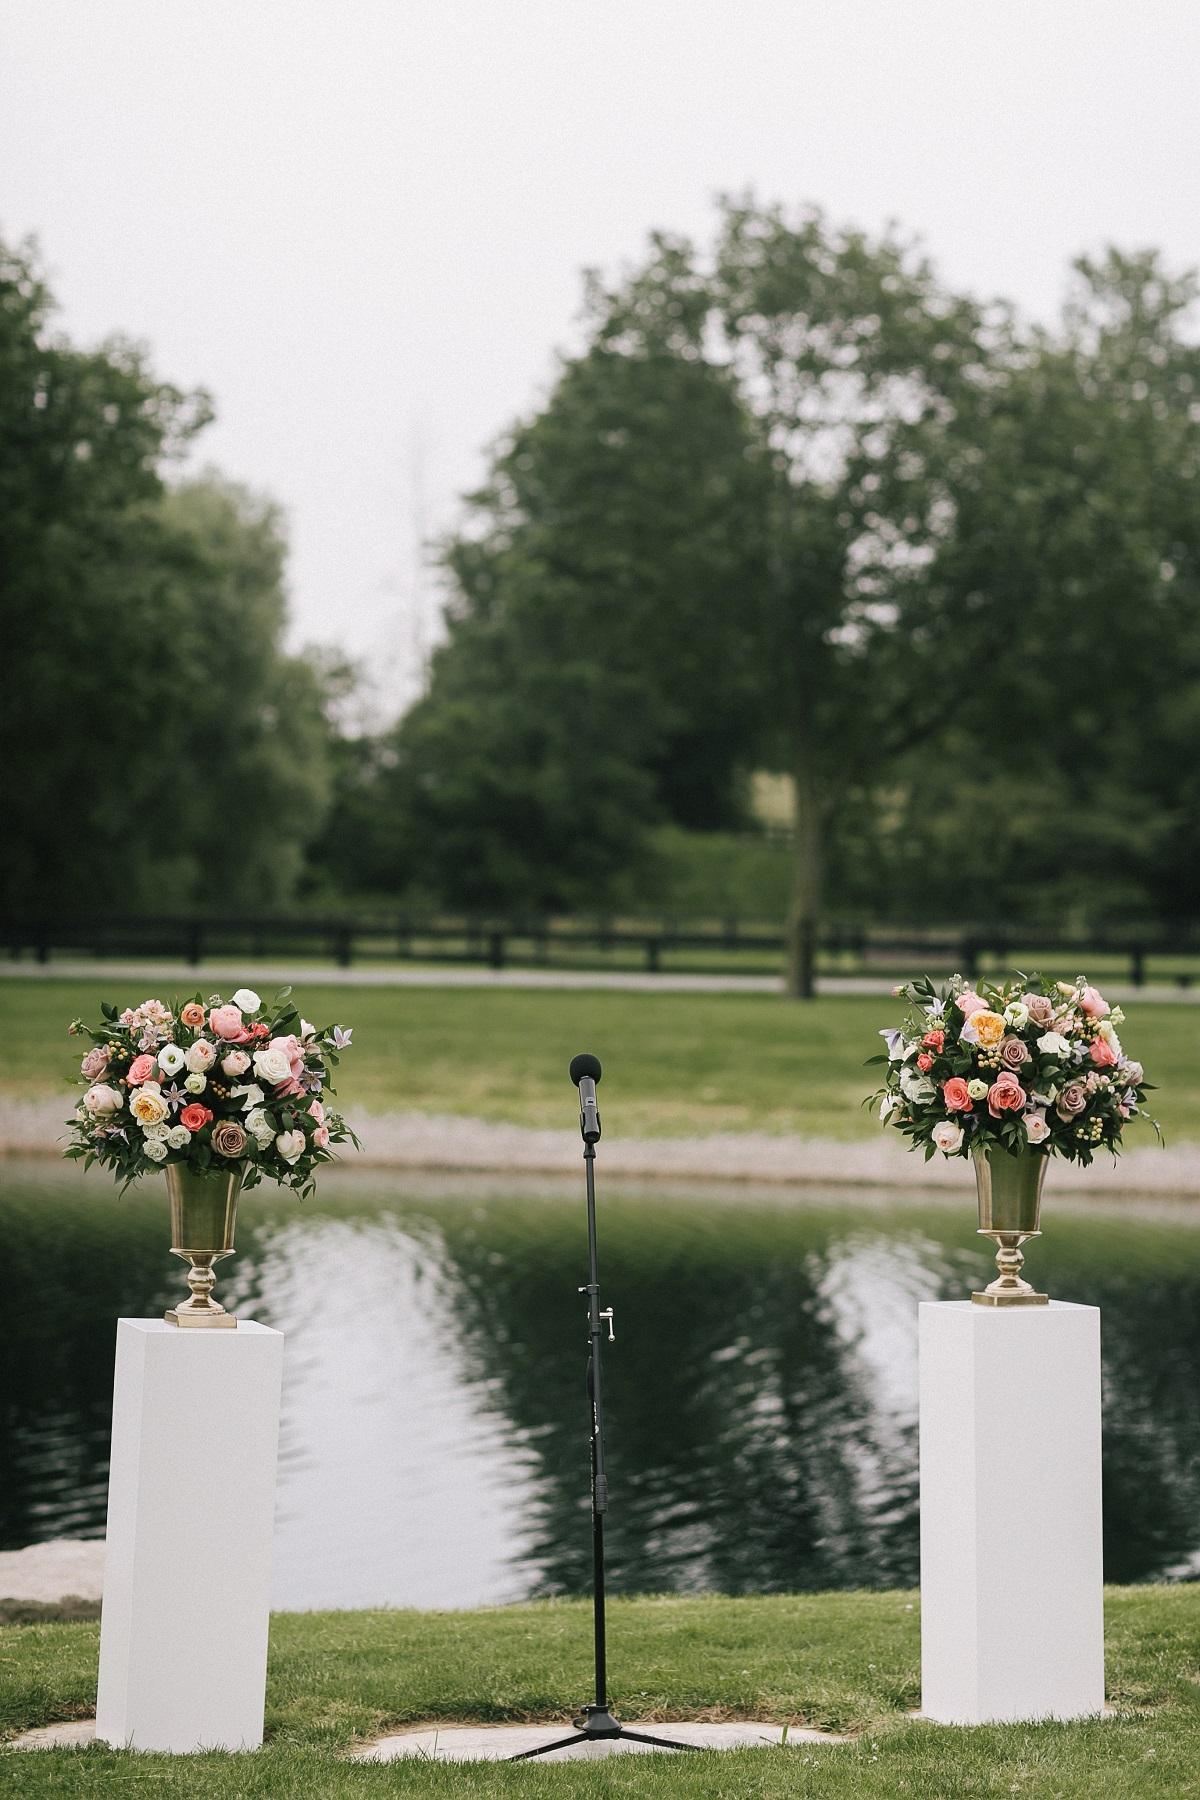 tented-wedding-planner-ancaster-kj-and-co 16.JPG